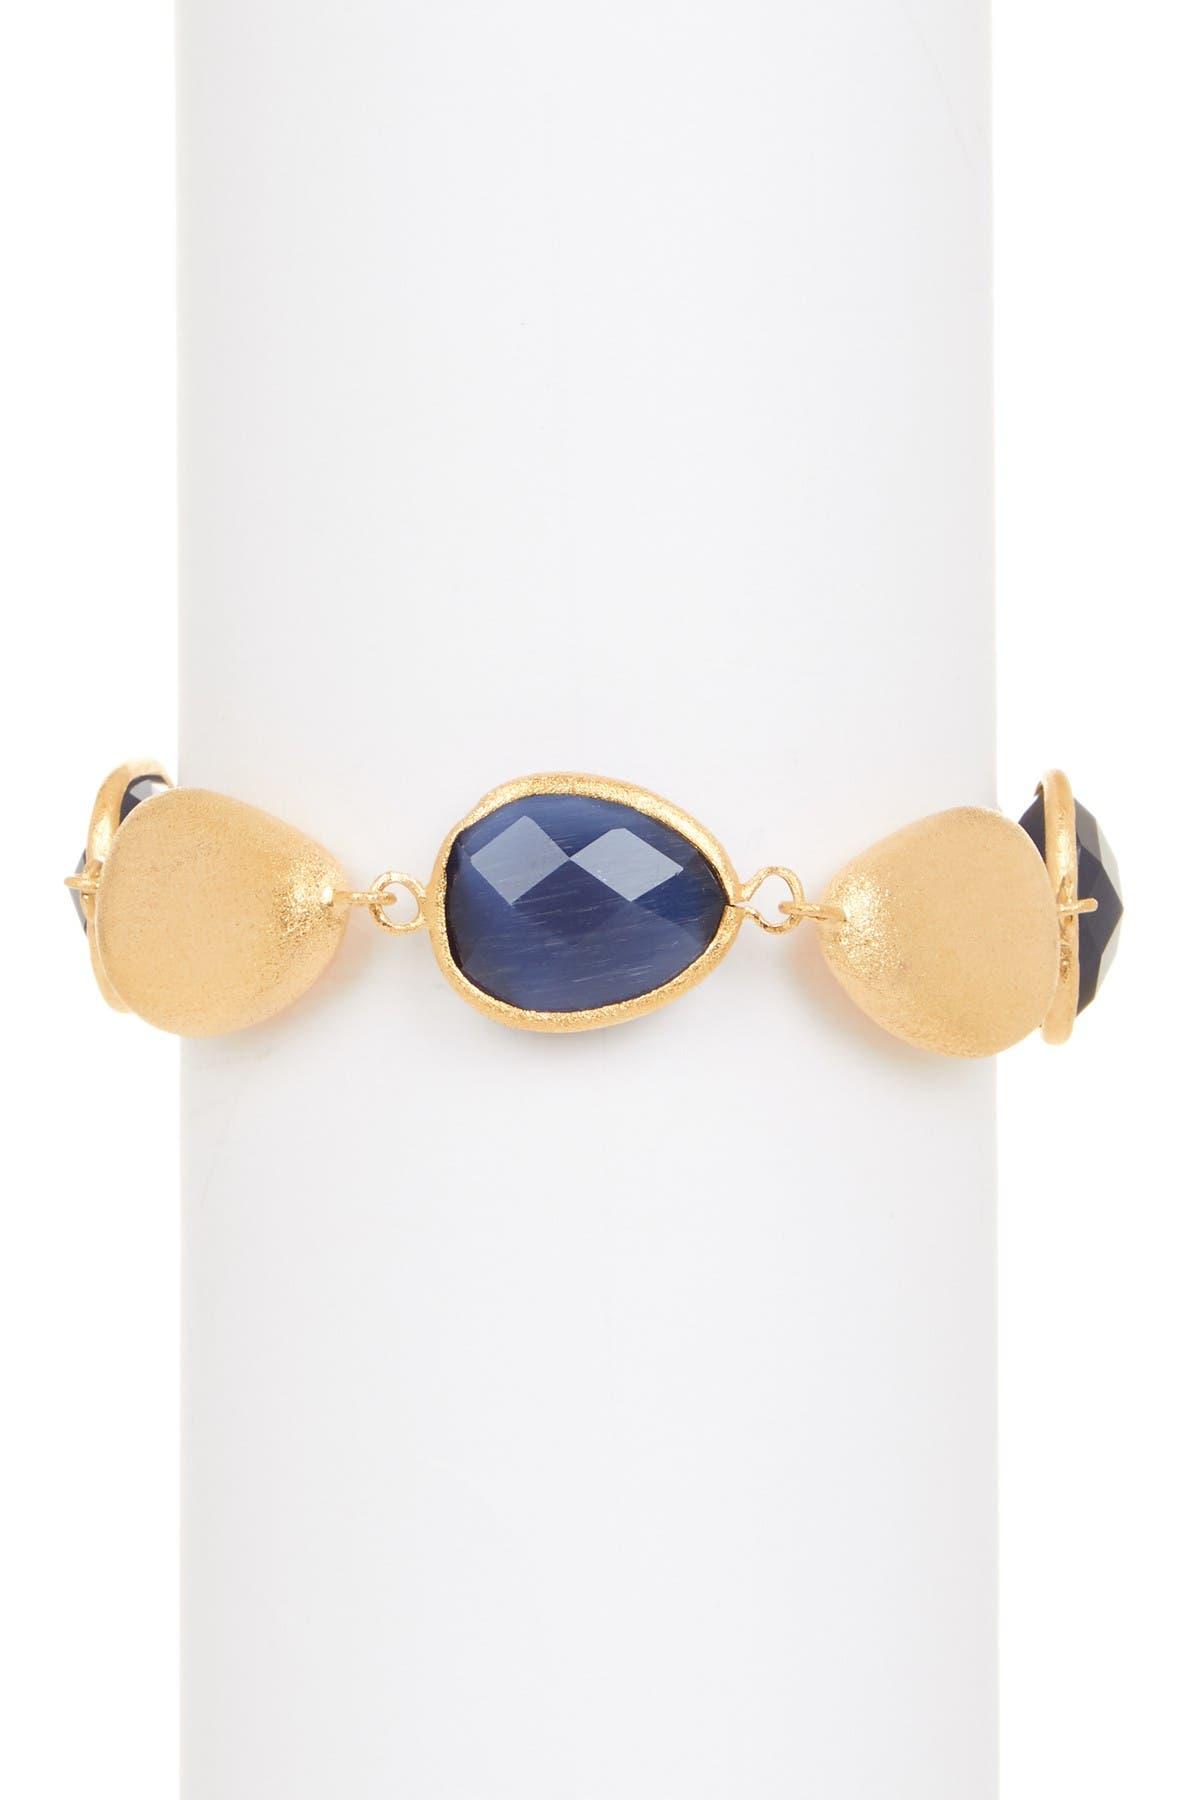 Image of Rivka Friedman 18K Gold Clad Cats Eye Crystal Satin Pebble Bracelet